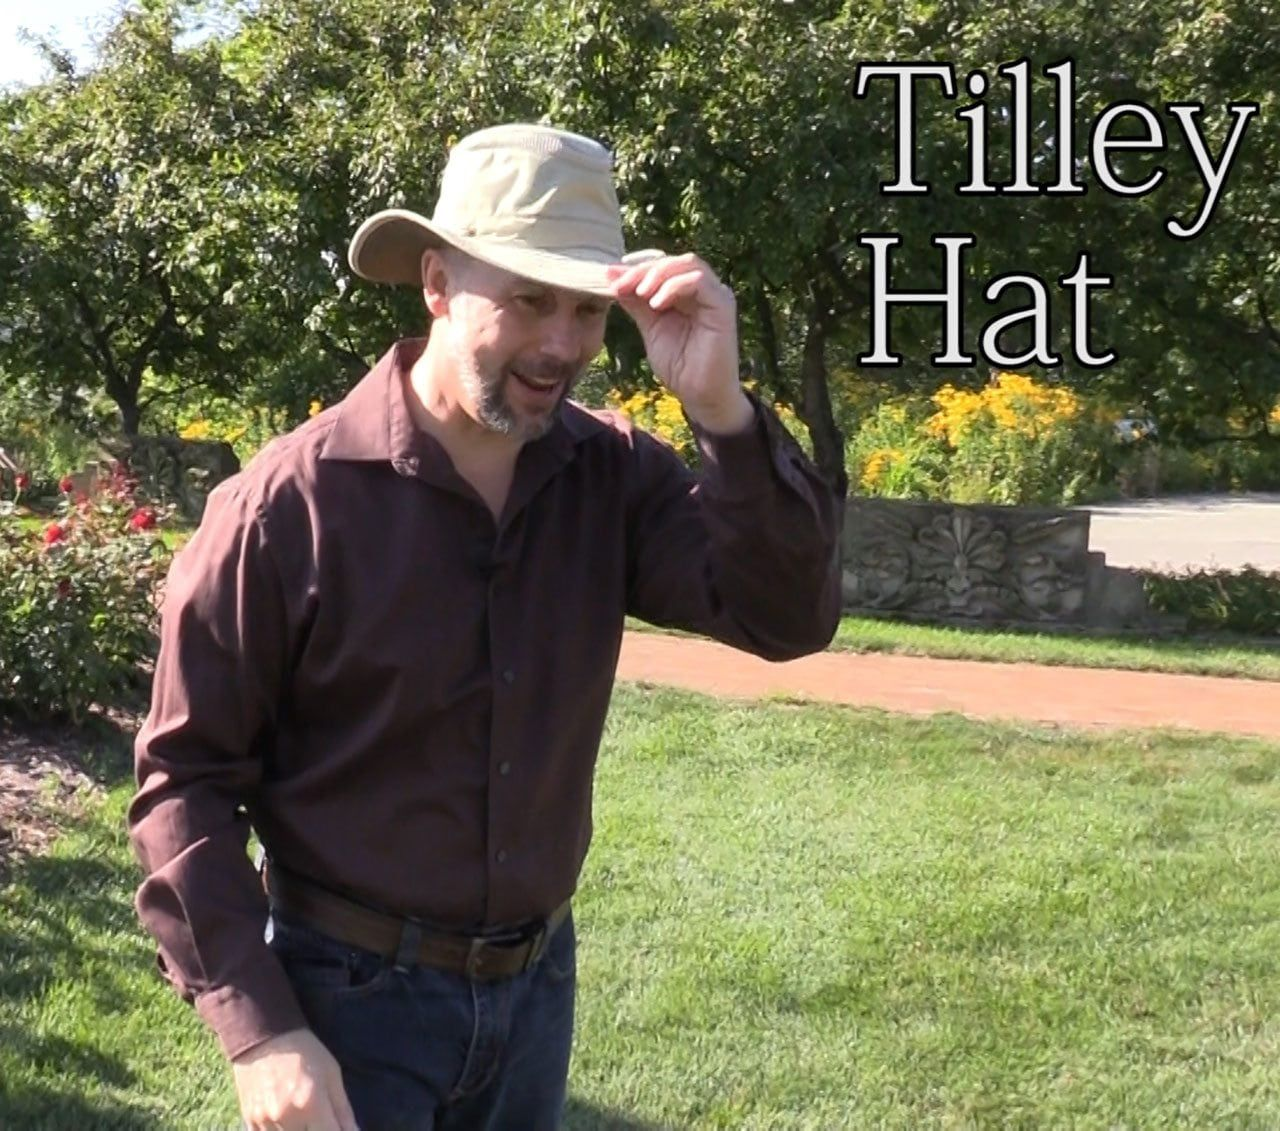 Ltm6 airflo hat khakiolive cool hats hats sun